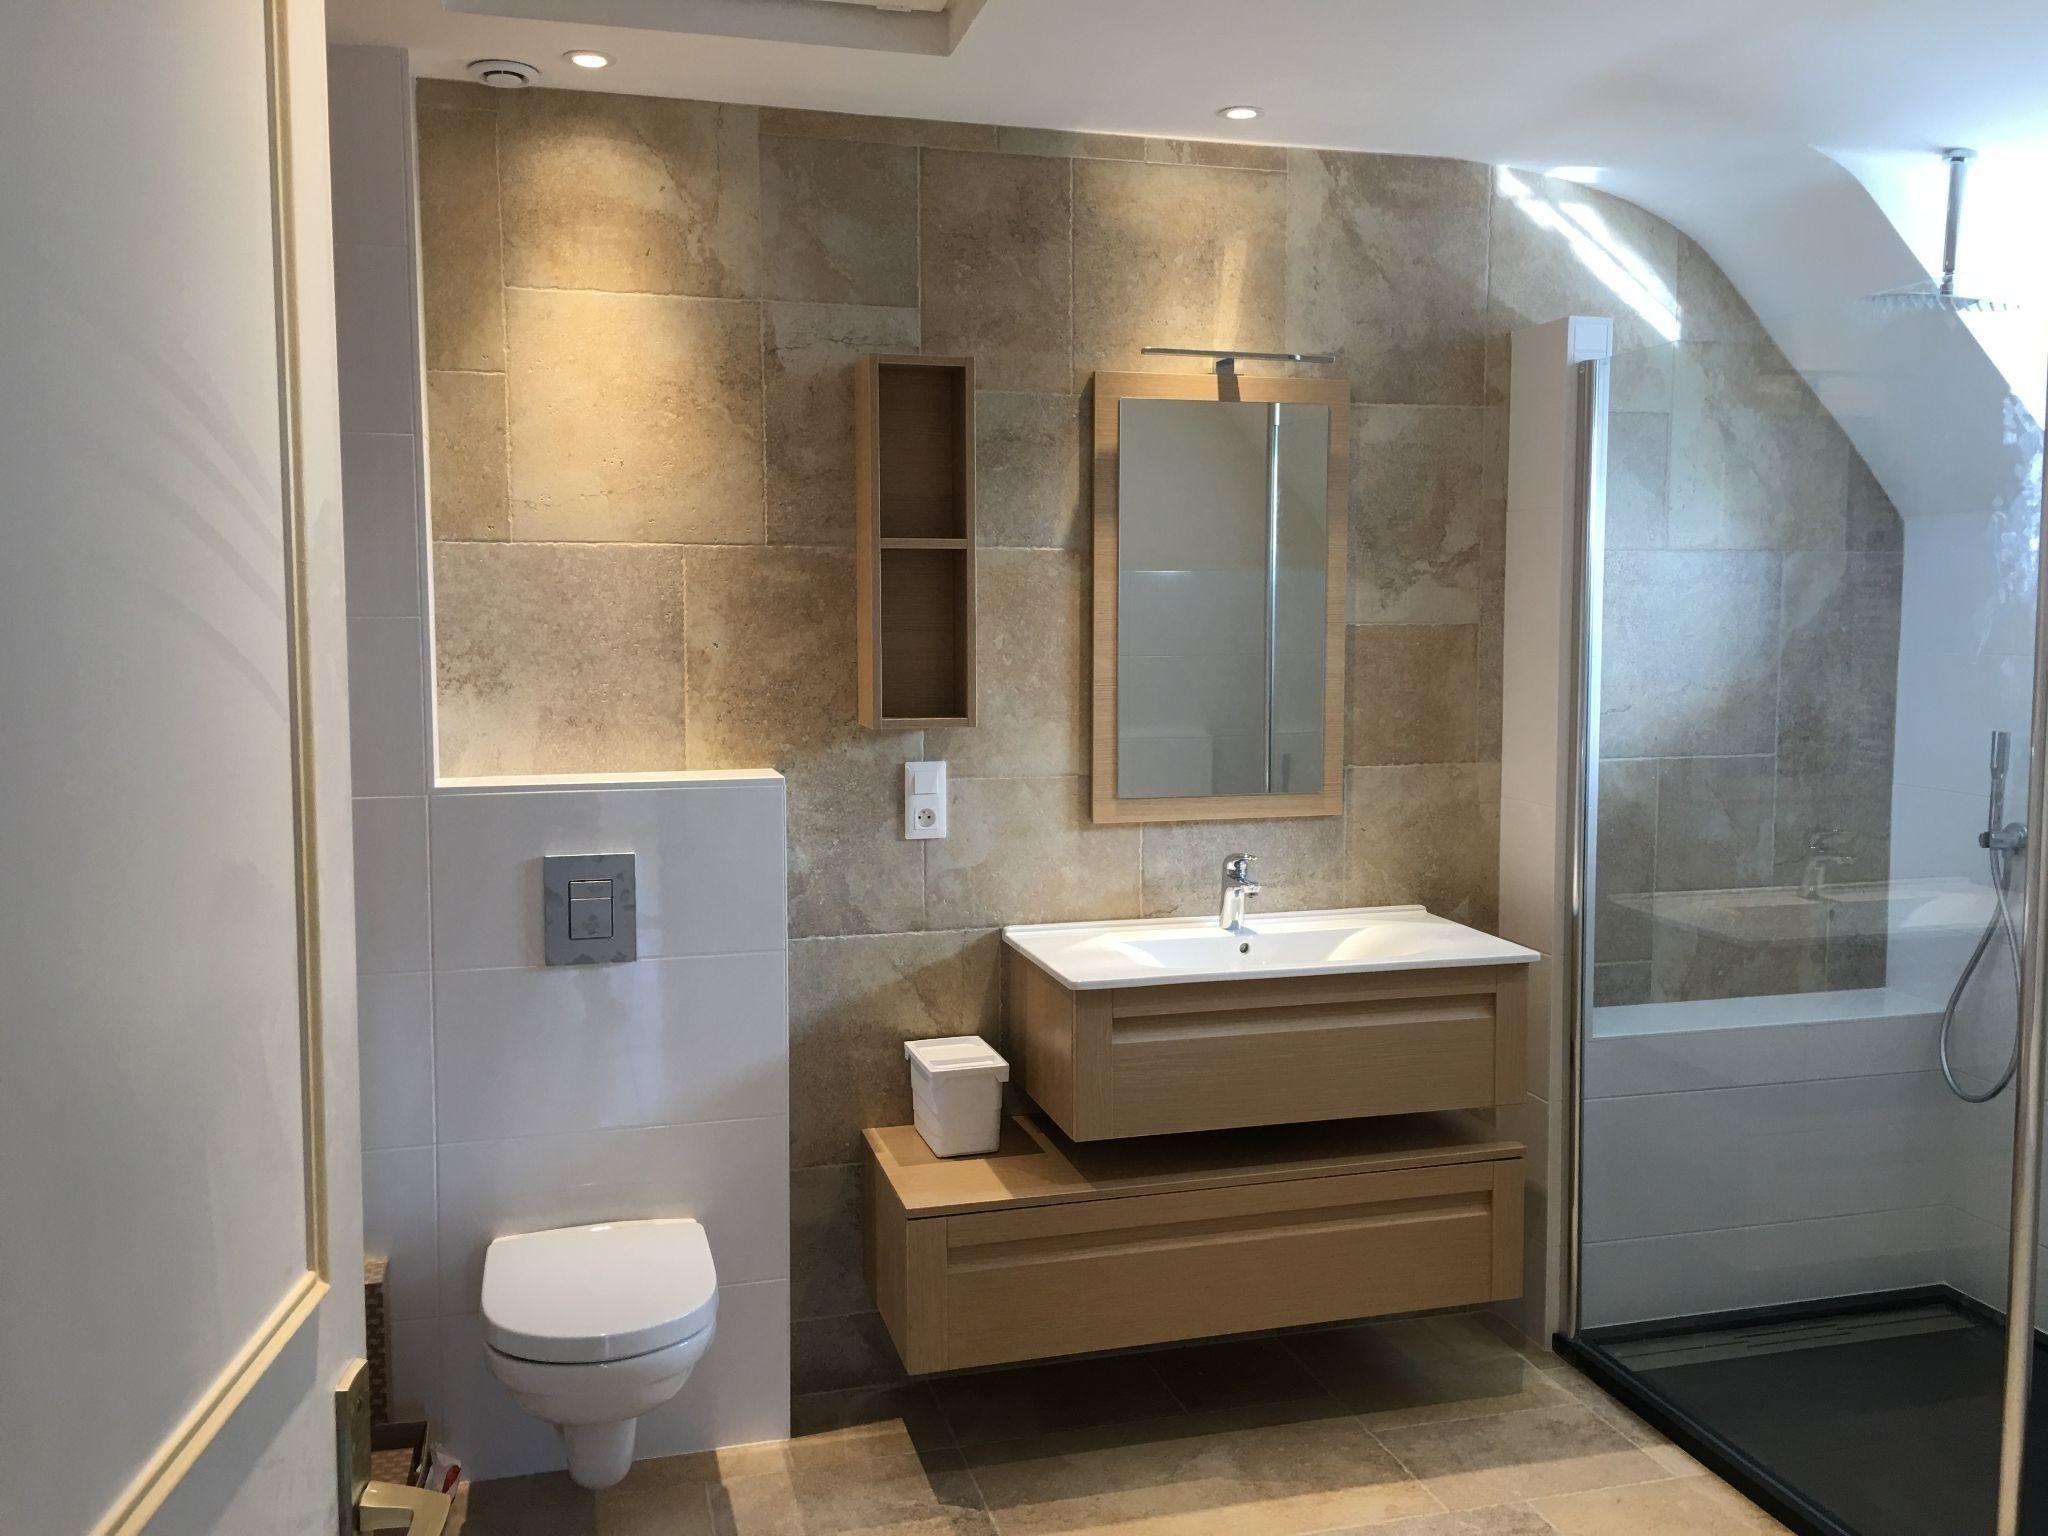 Carrelage Salle De Bain Vert Emeraude ~ douche salle de bain toilettes carrelage fa ence r novation r alis